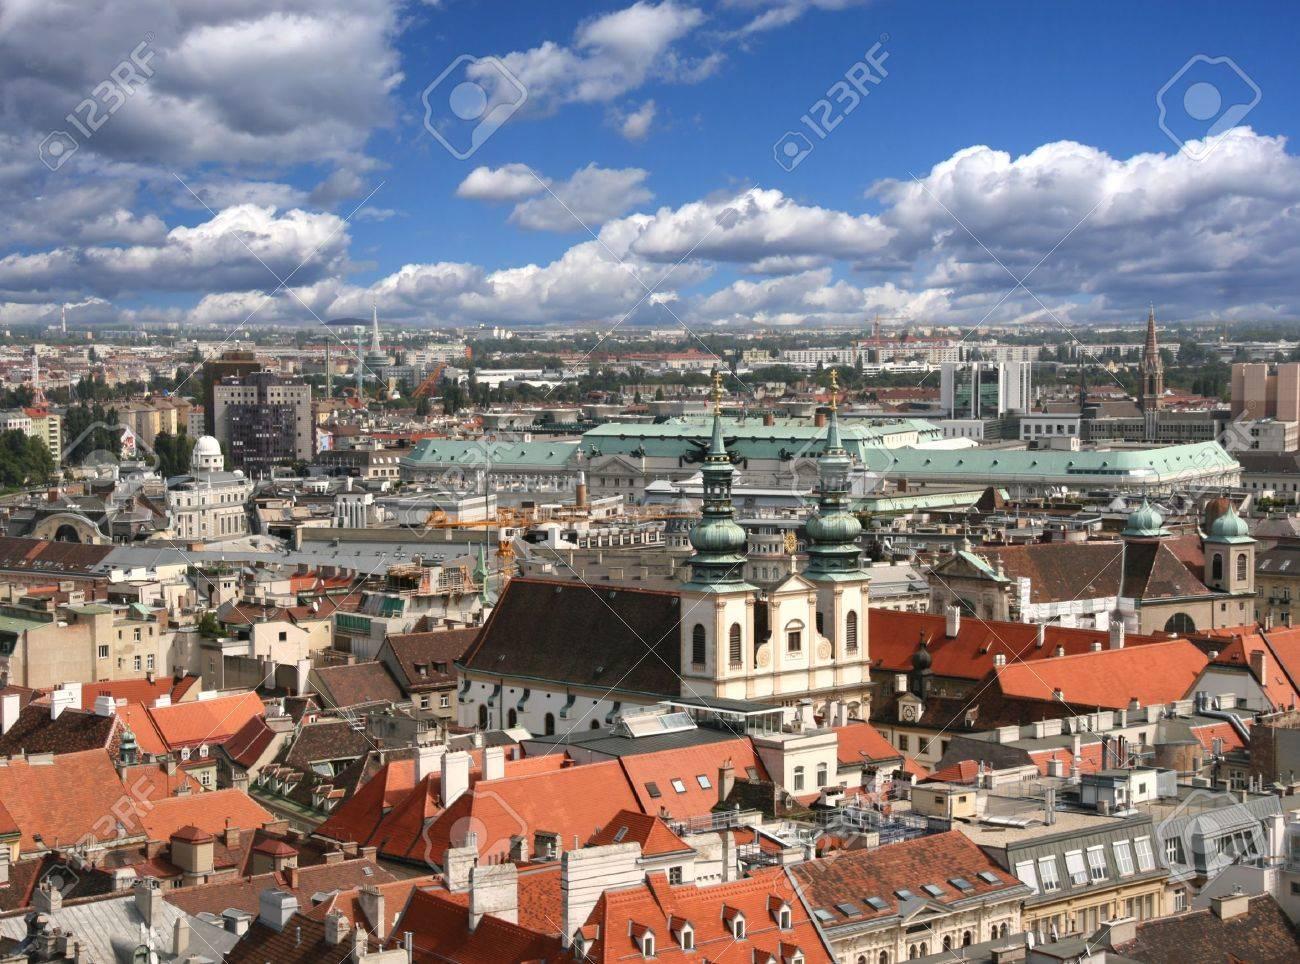 Vienna aerial view - University Church, Dominican Church and Regierungsgeb&auml,ude are visible Stock Photo - 3160702